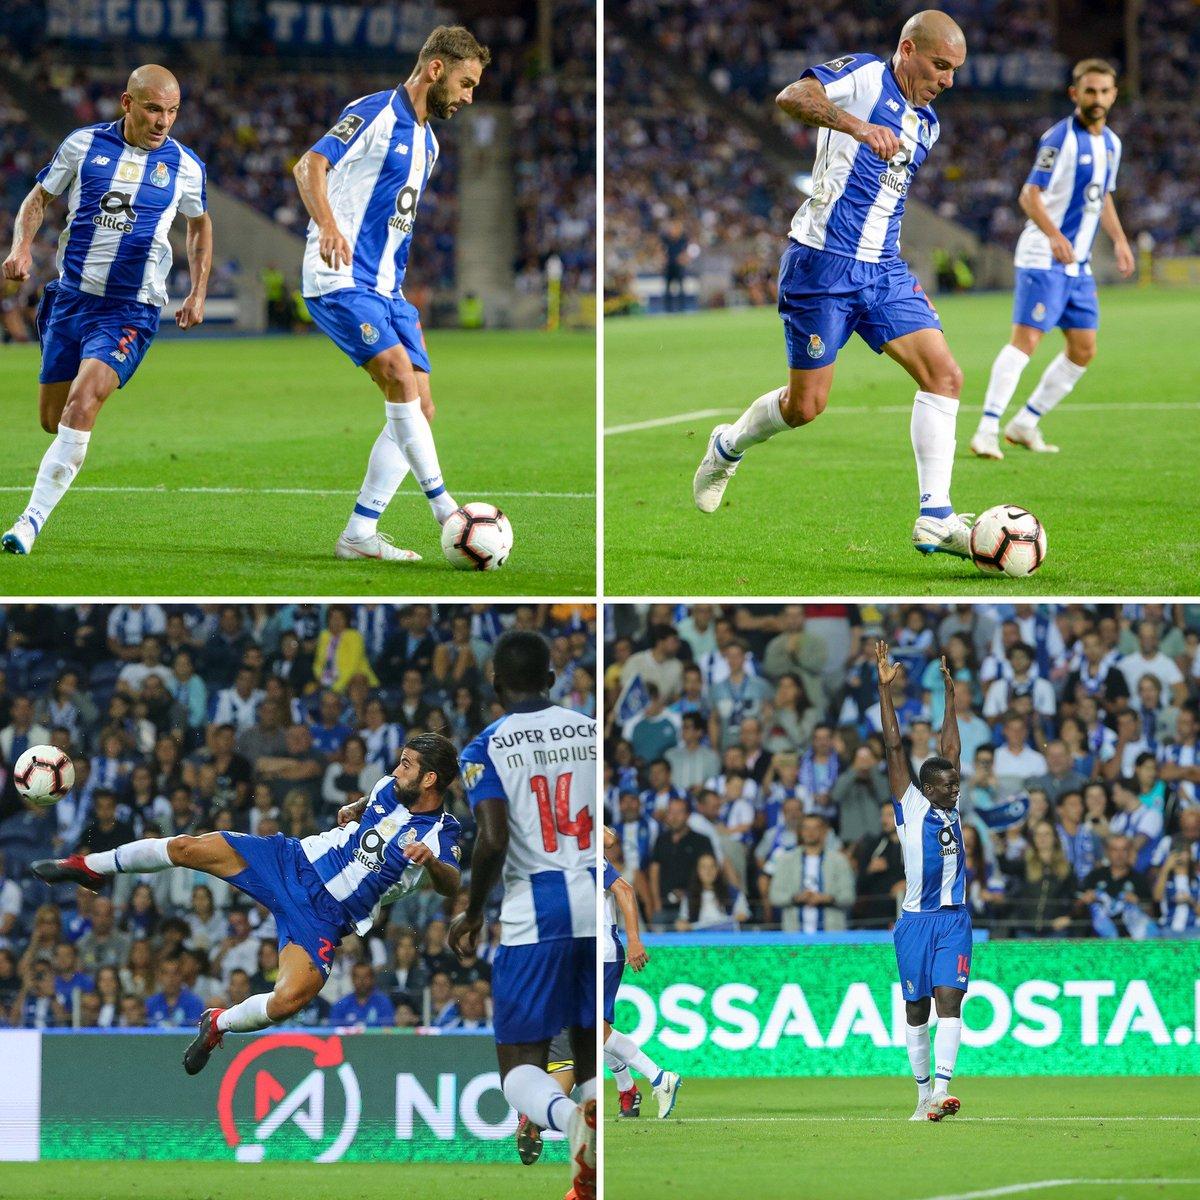 ⚽ 1 golo em 4 imagens 📸 #FCPorto #FCPGDC #estadiododragao